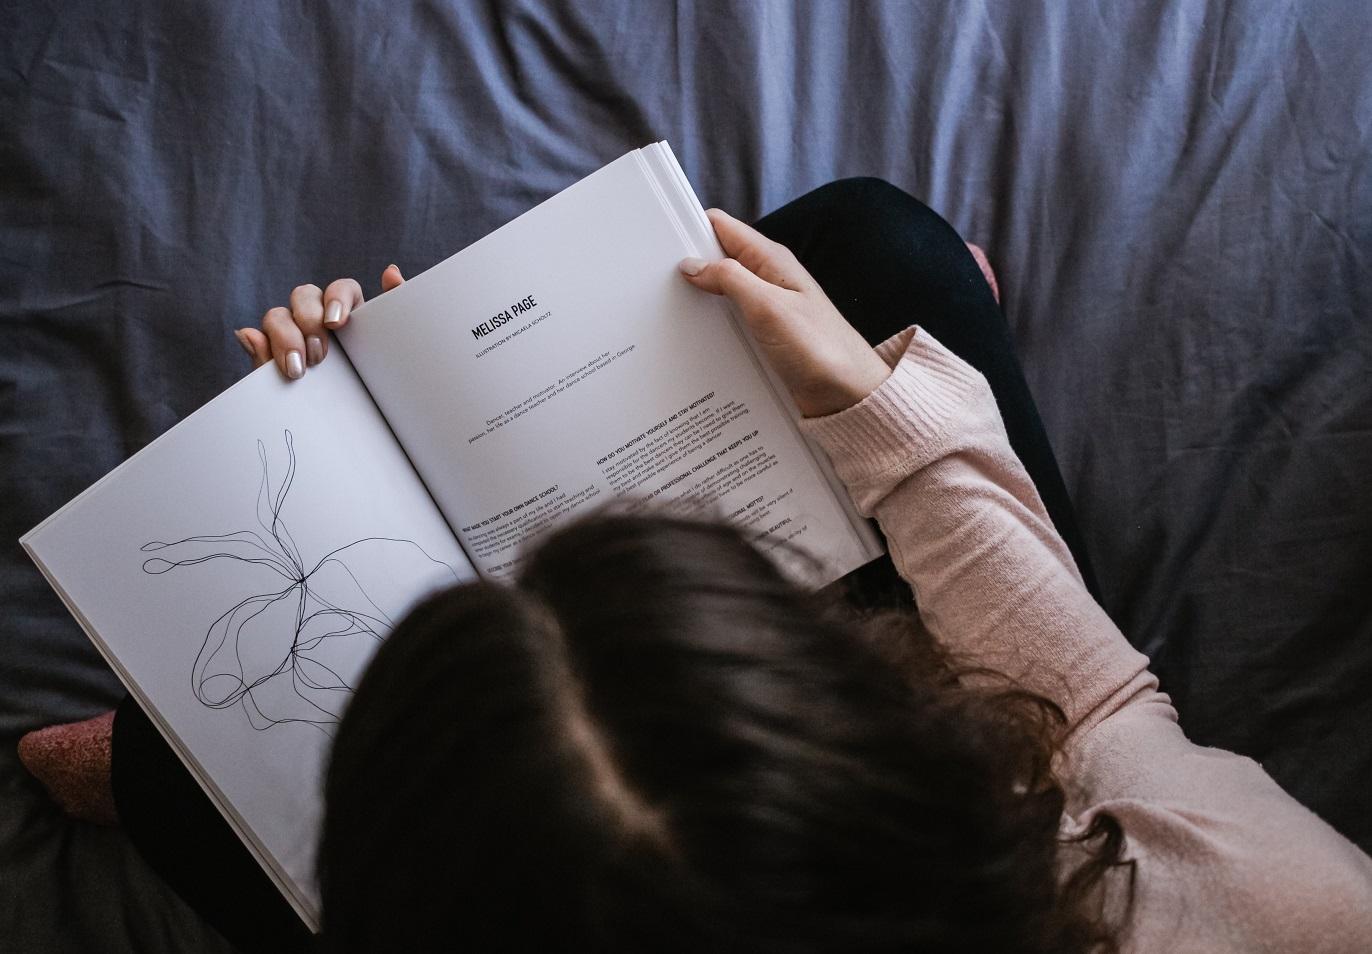 woman reading powerful books by women